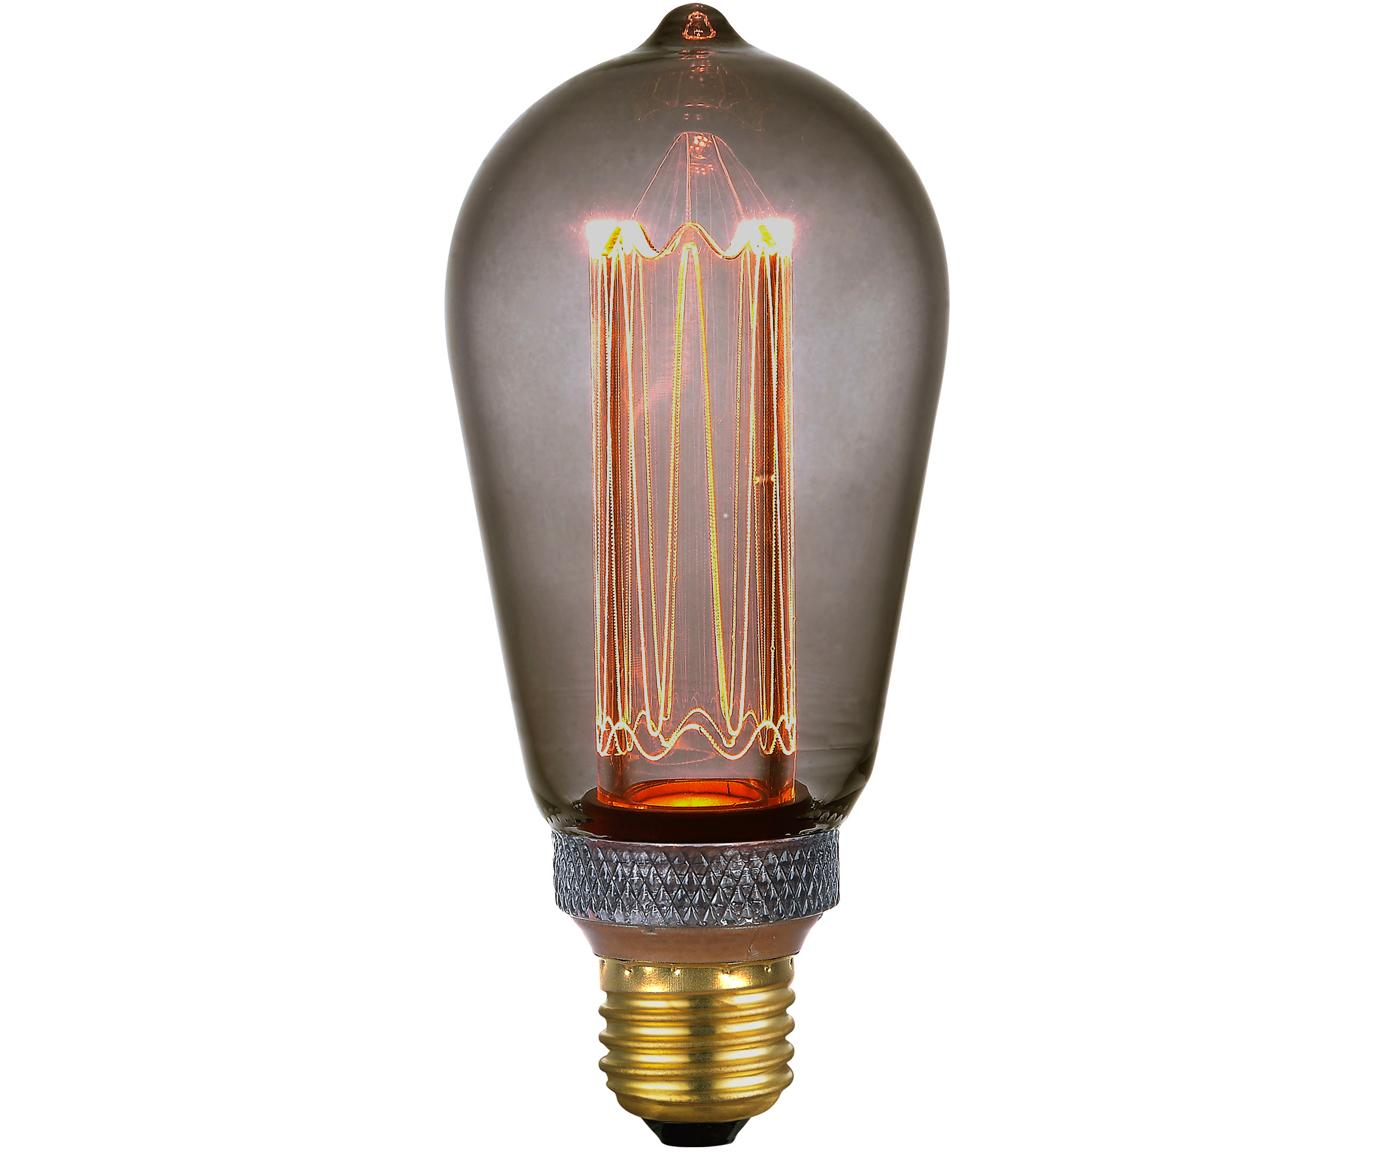 Dimbaar LED lamp Colors Drop (E27 / 5W), Glas, gecoat metaal, Grijs, transparant, Ø 6 x H 14 cm